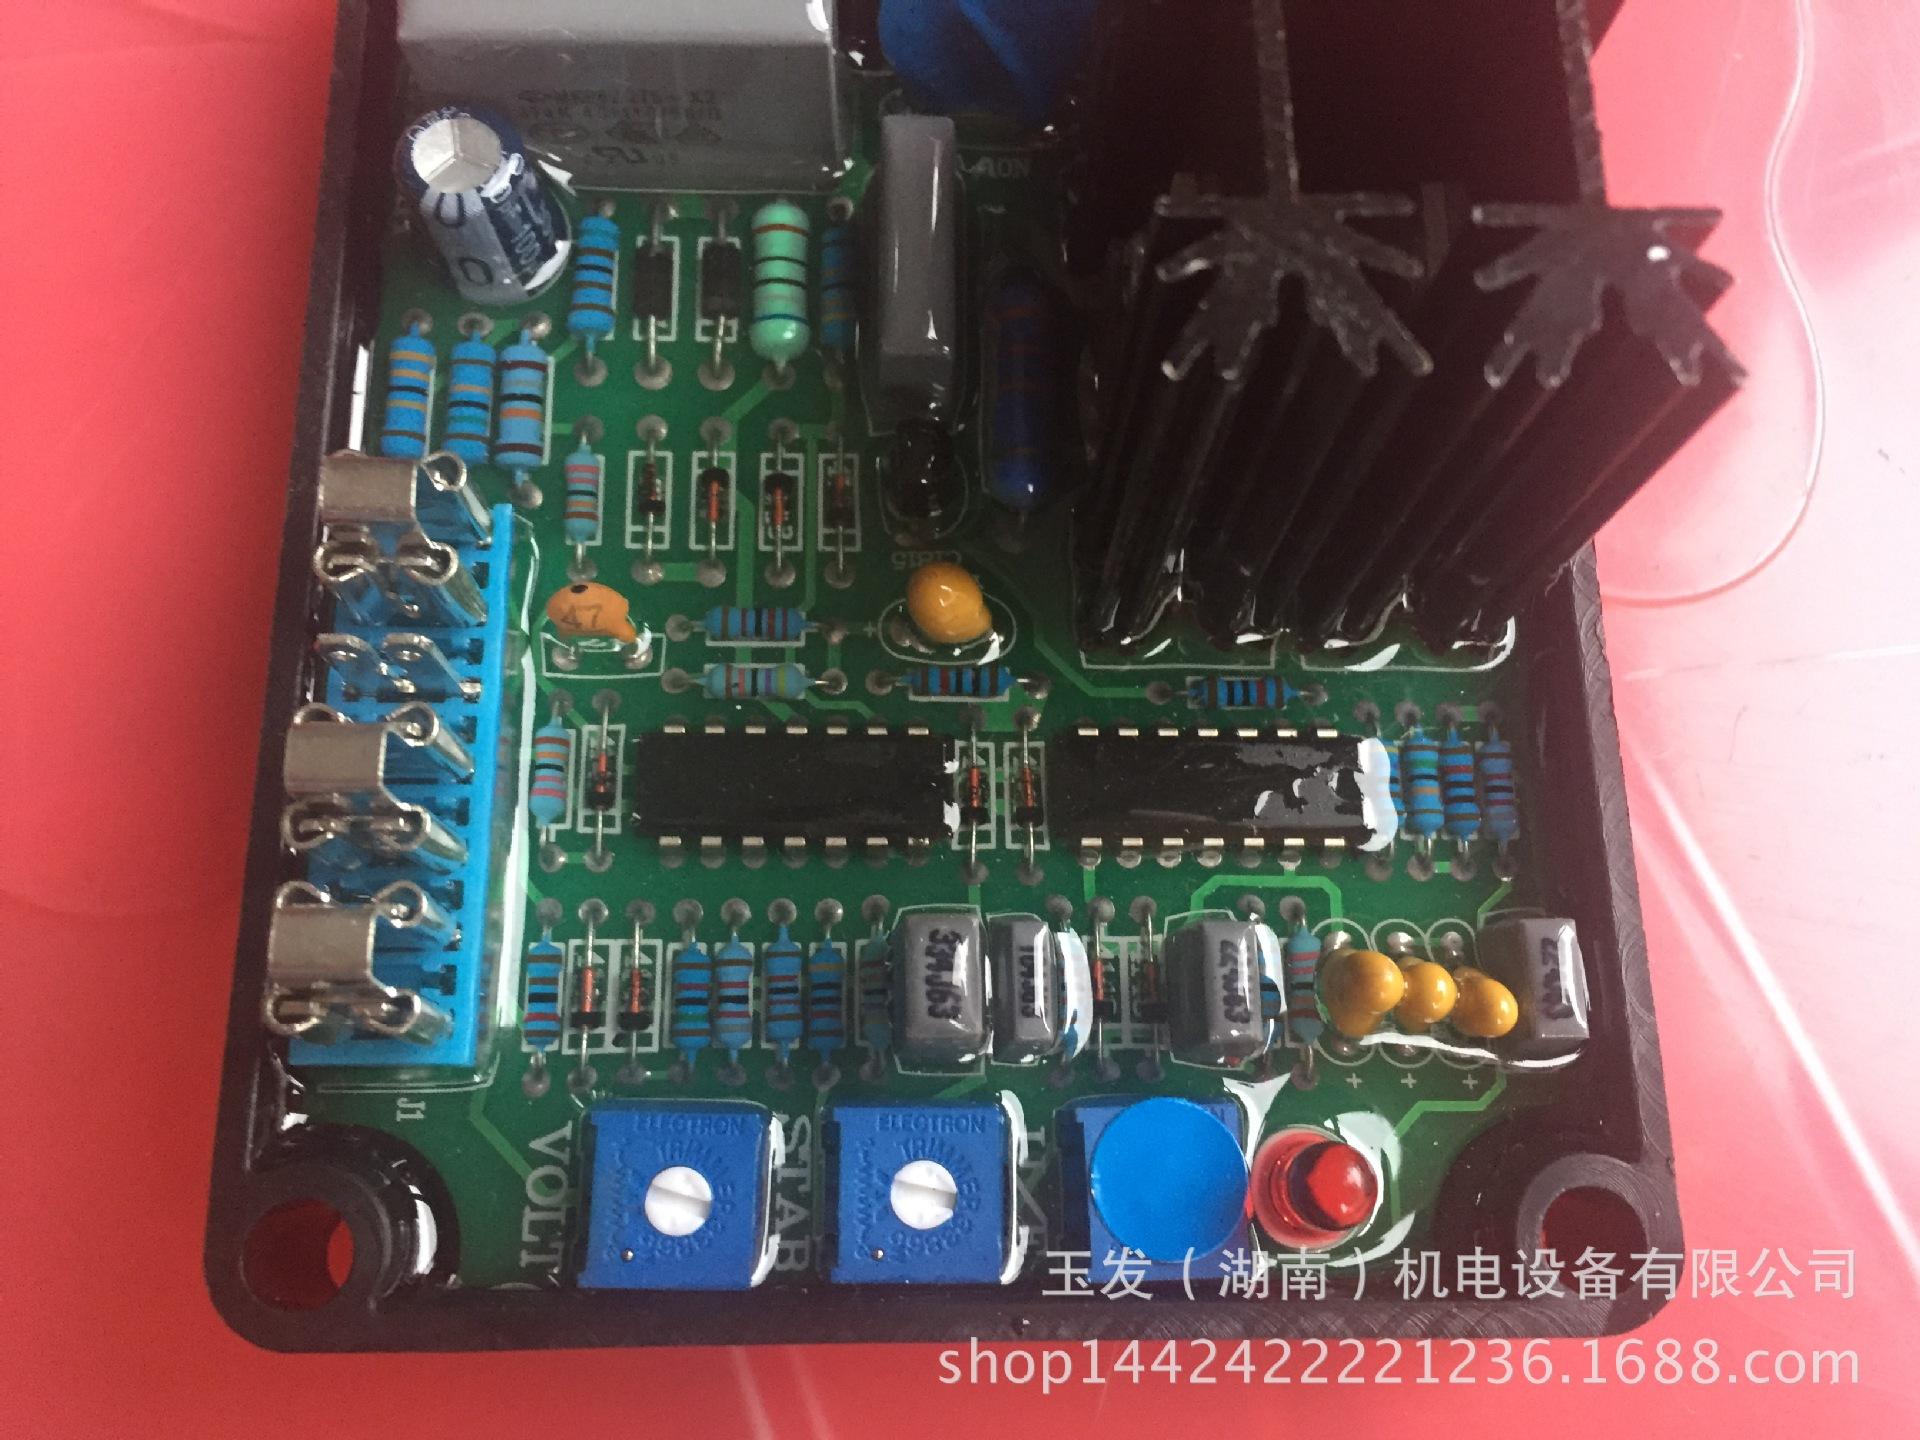 pesen mootori müük ei AVR-8A 10KW-50KW rõhuregulaator